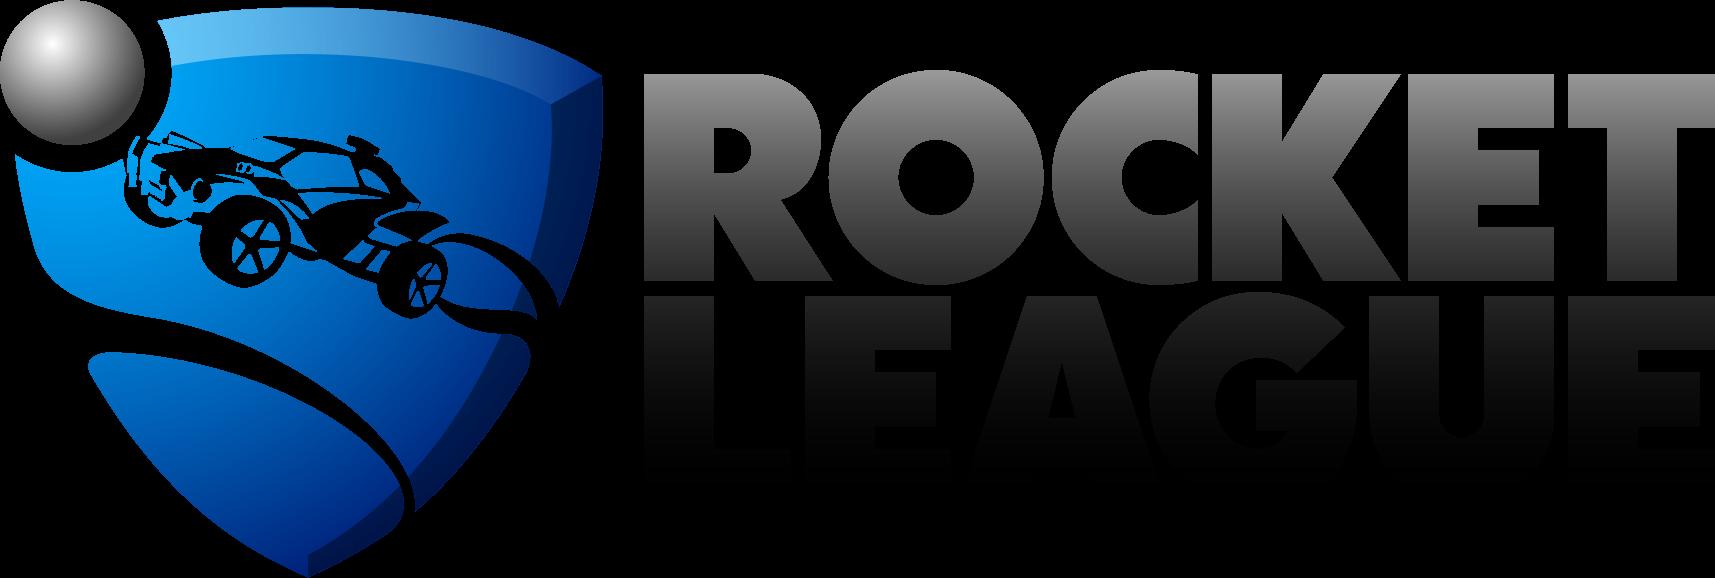 Youtube clipart rocket league. Steam community guide item